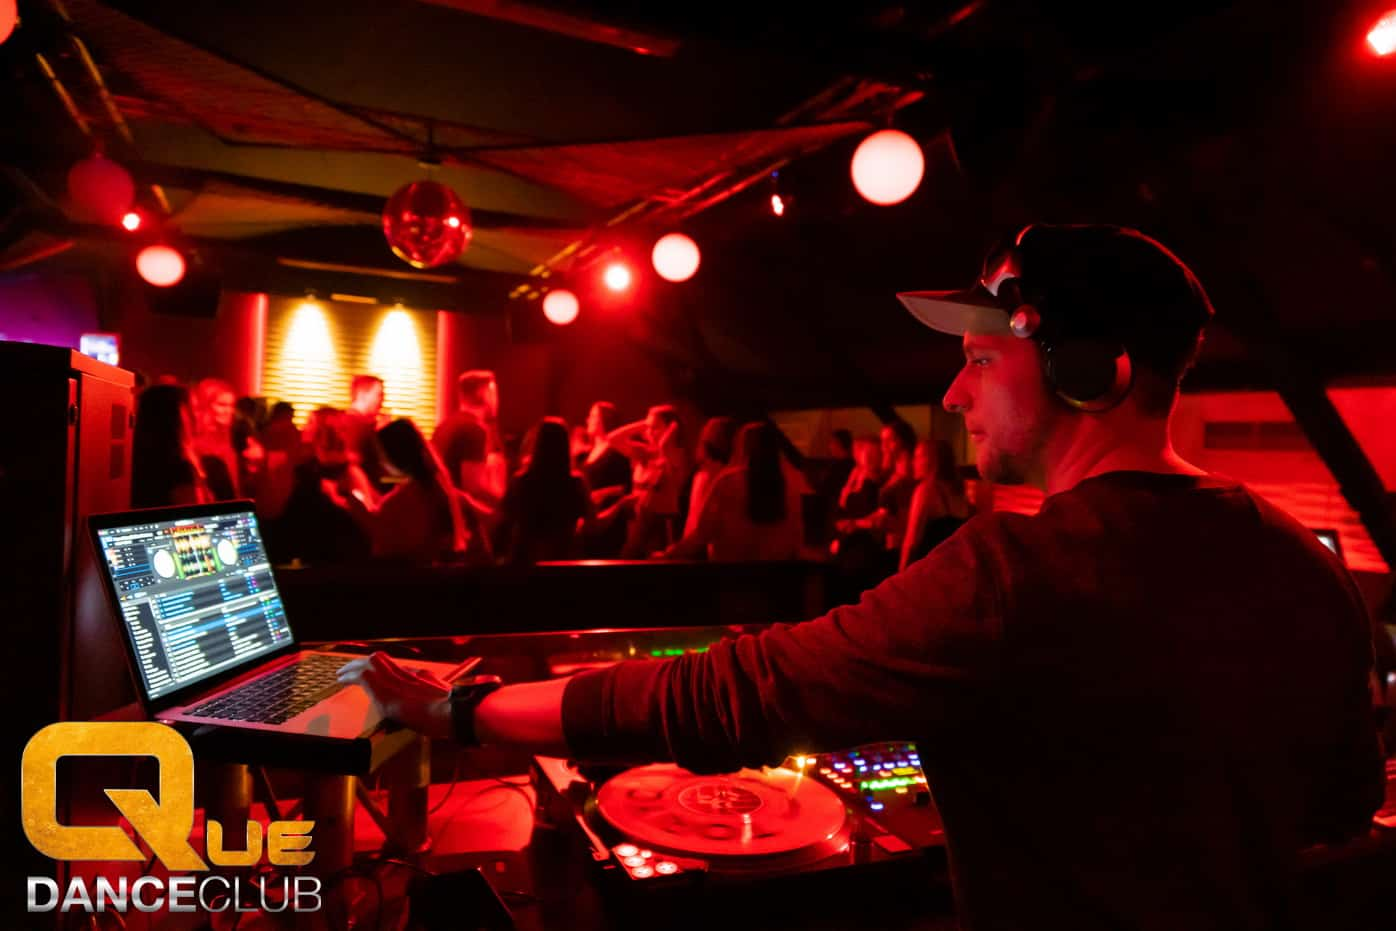 2018_12_20_Que_Danceclub_XMAS_Abiparty_United_Nightlife_Scene_Timo_038